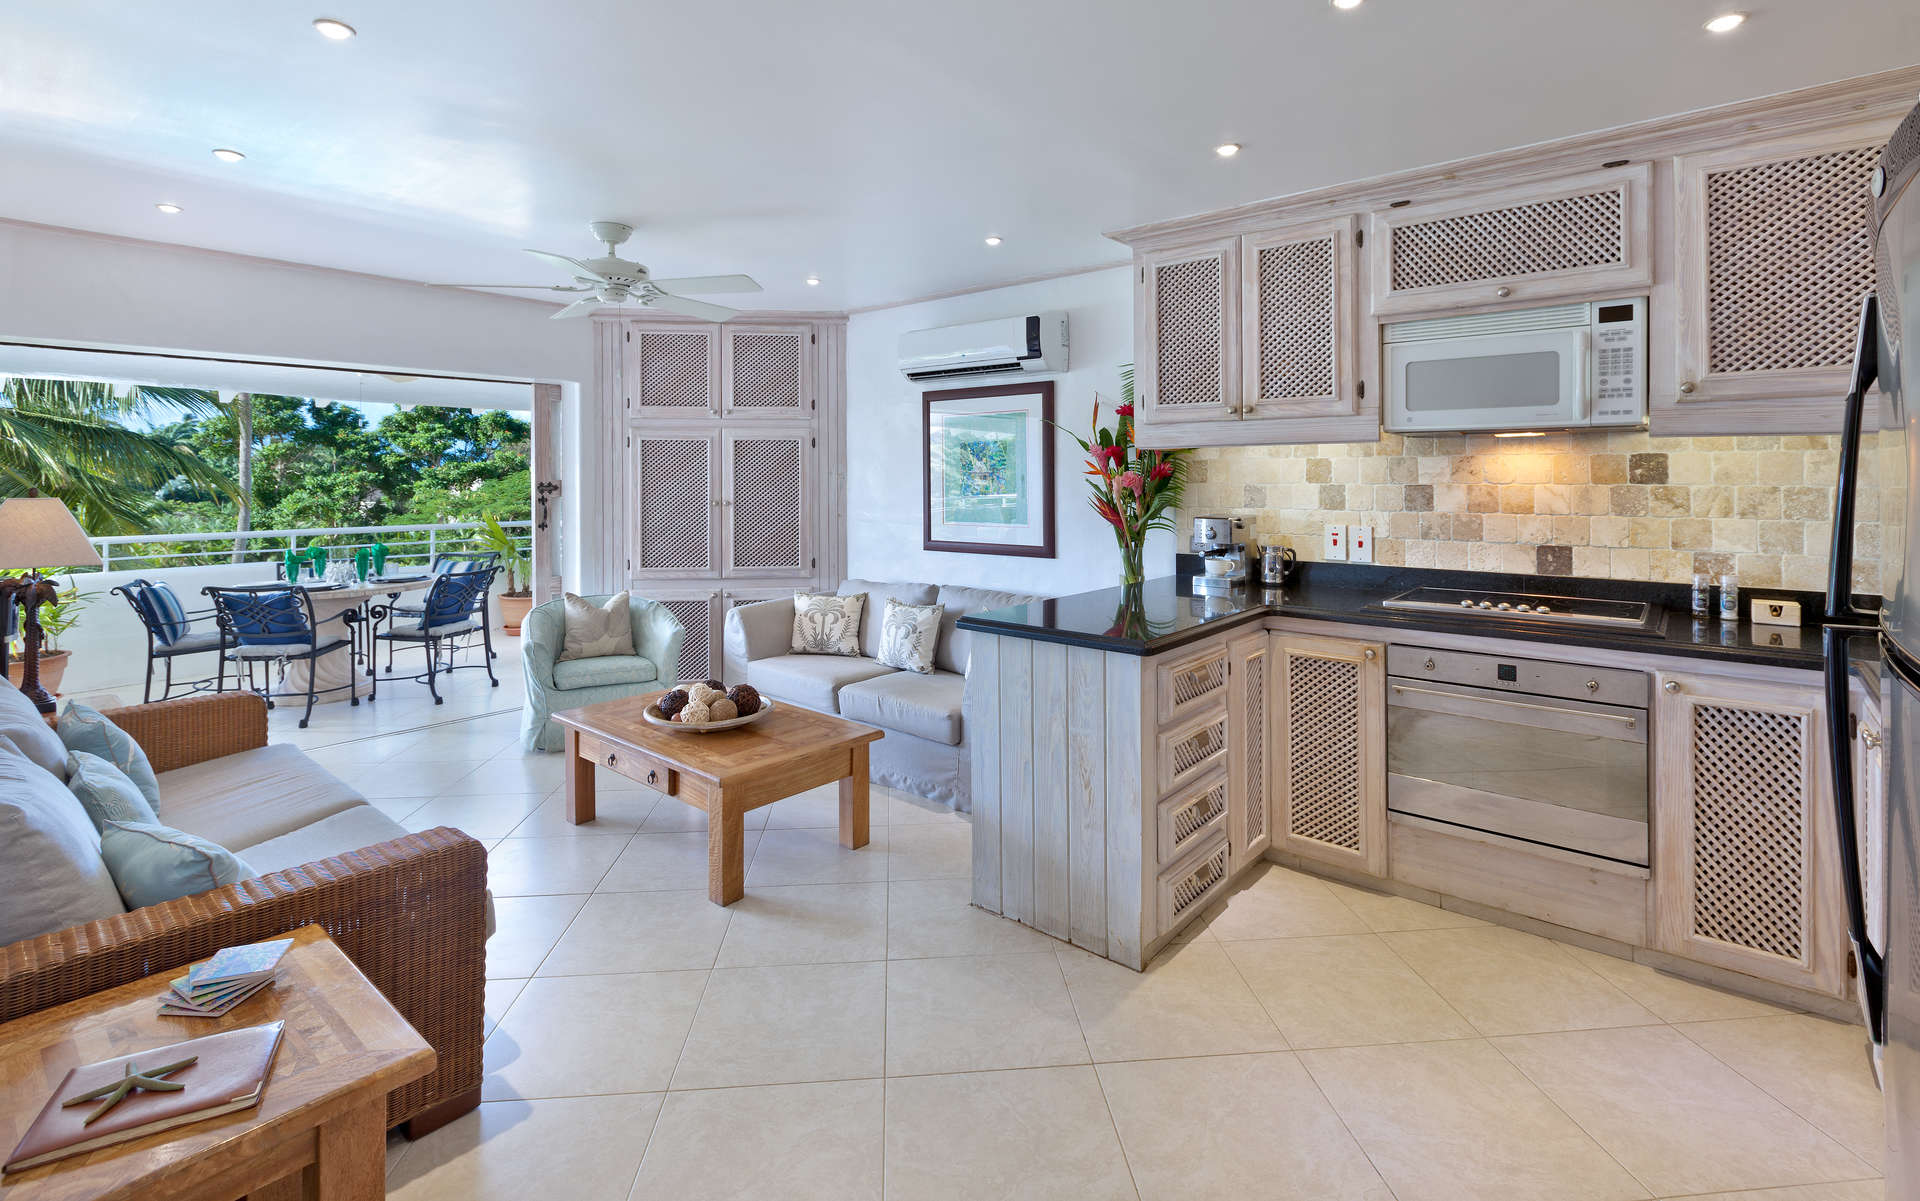 Luxury villa rentals caribbean - Barbados - St james - Porters - Glitter Bay 409 | Penthouse - Image 1/8